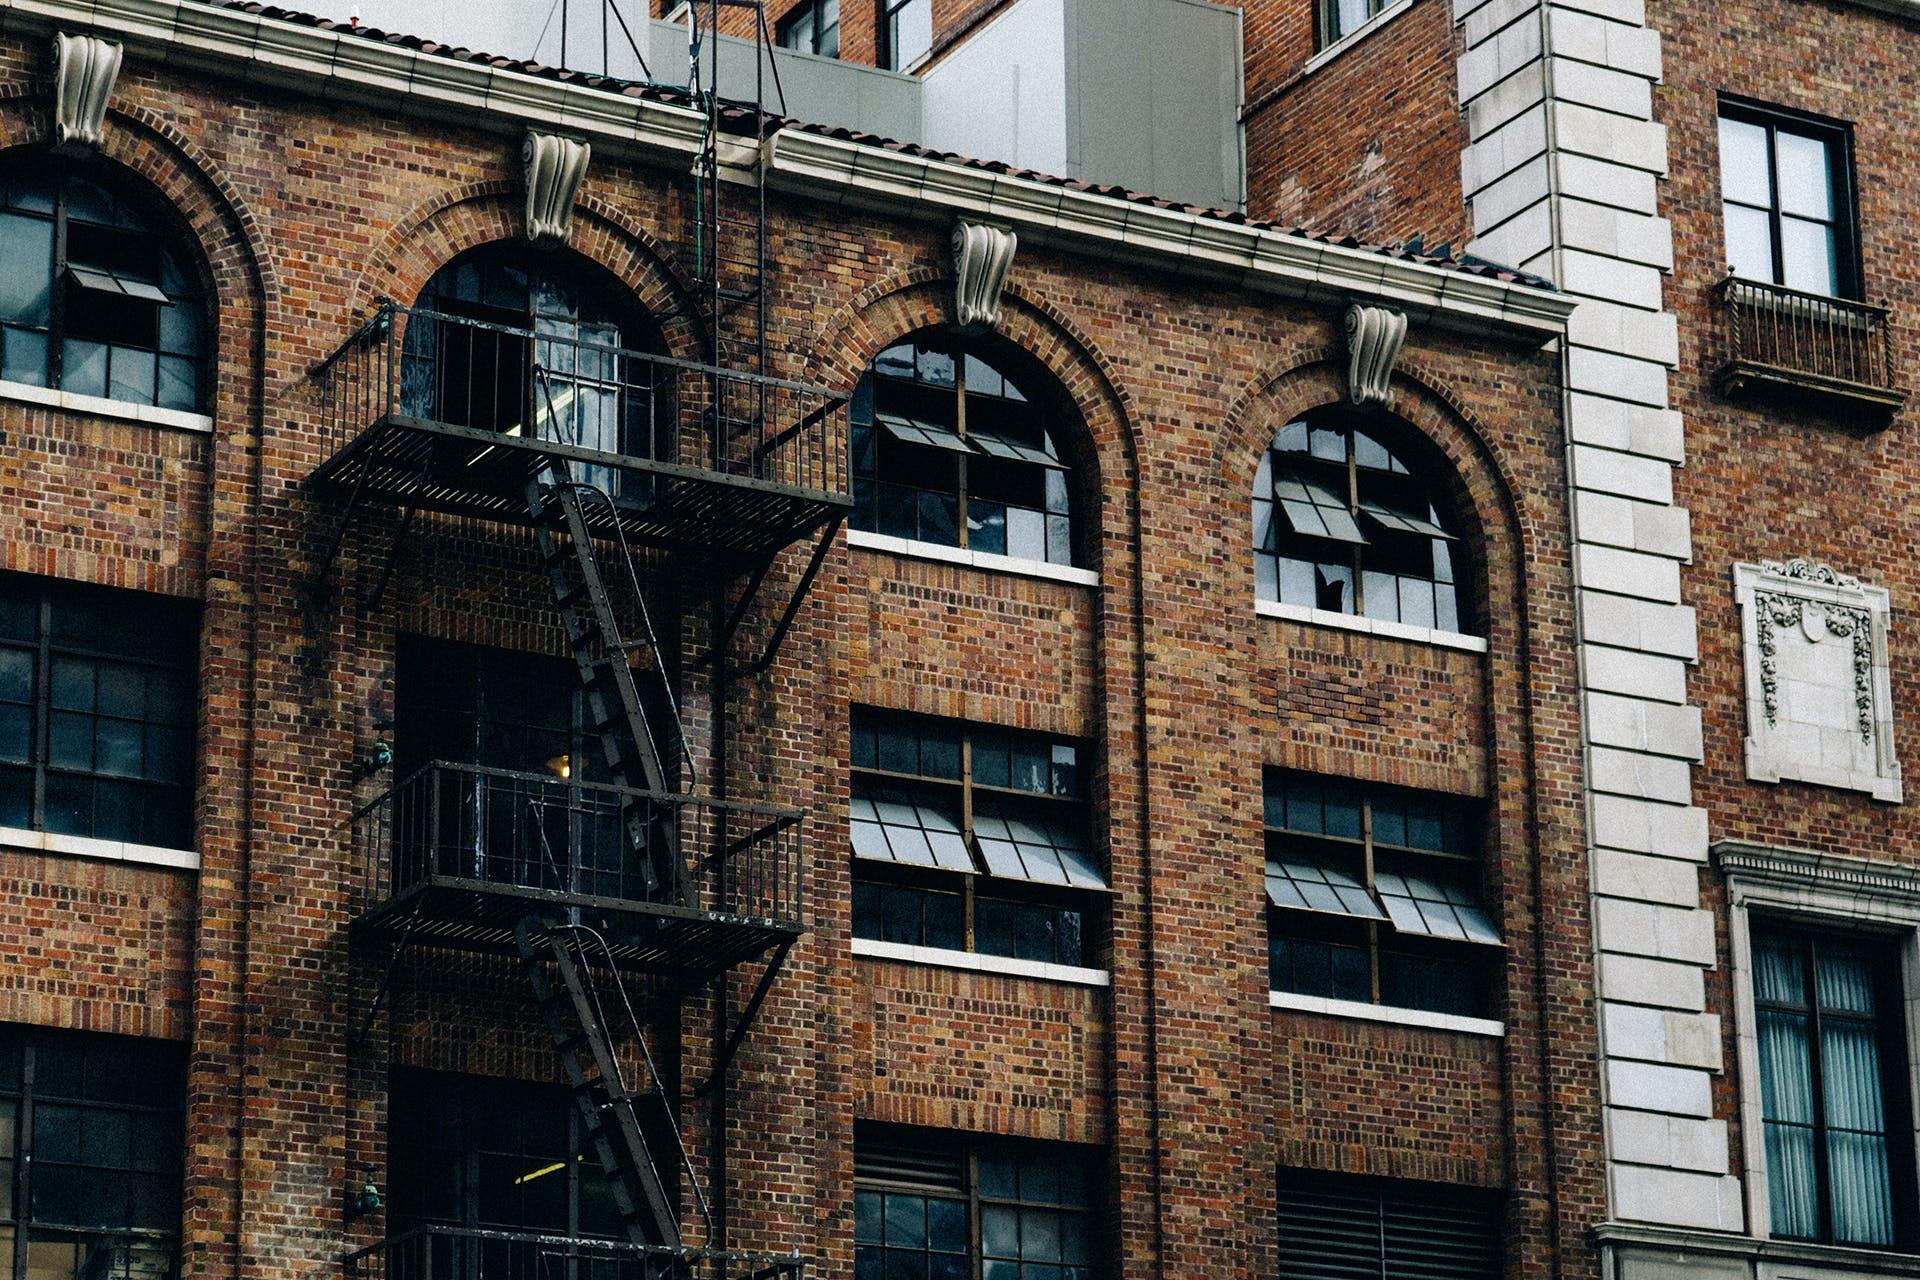 bricks, building, fire escape